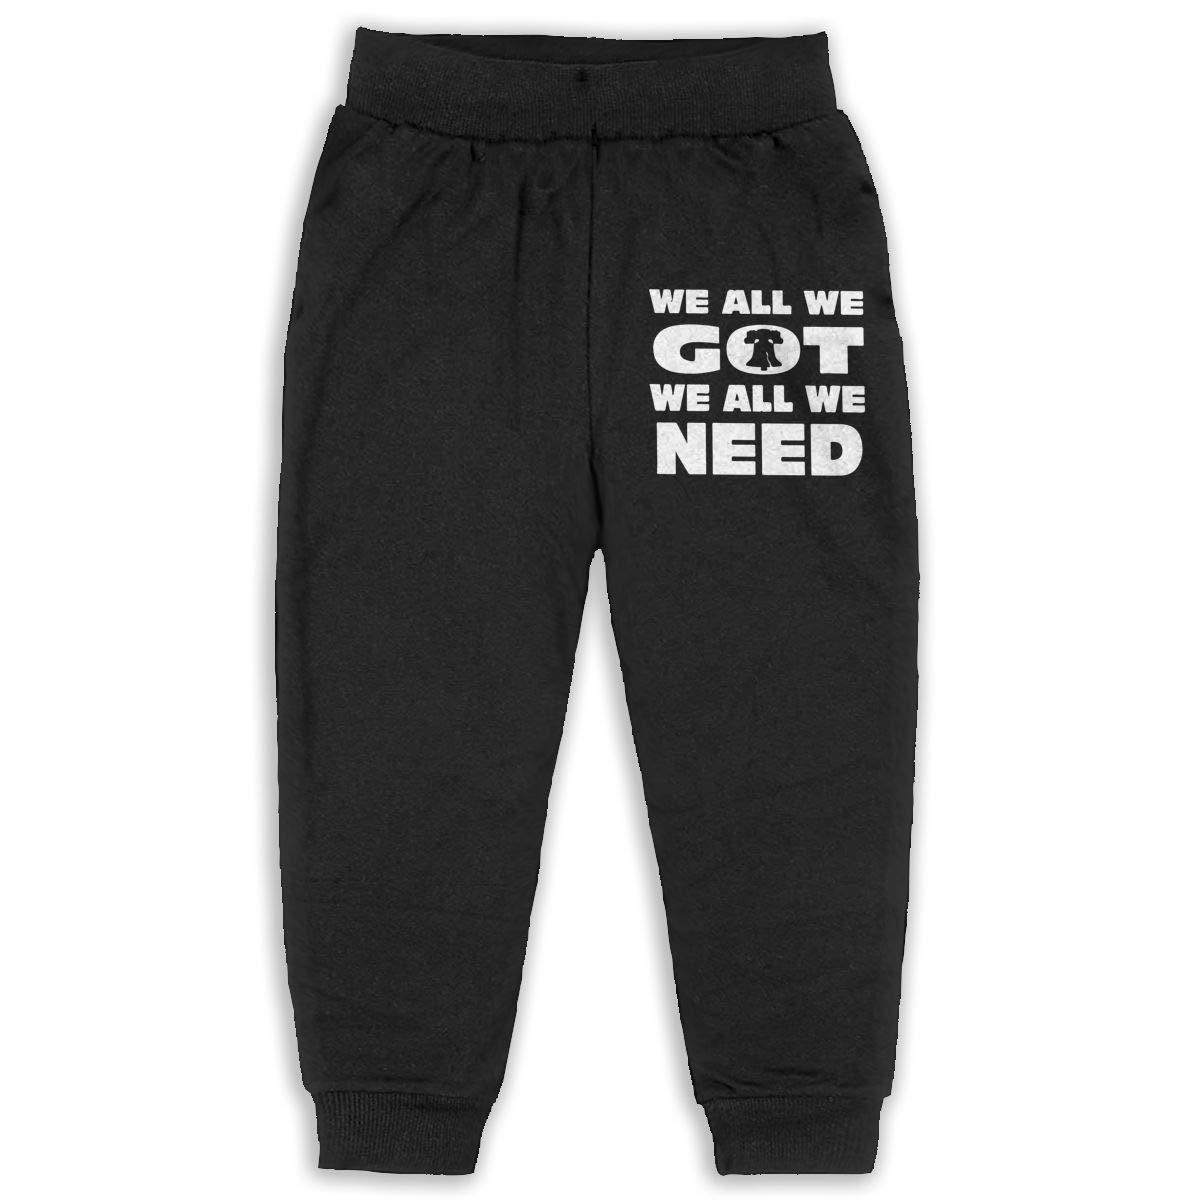 Soft Cozy Girls Boys Elastic Trousers Udyi/&Jln-97 The We All We Unisex Baby Sweatpants